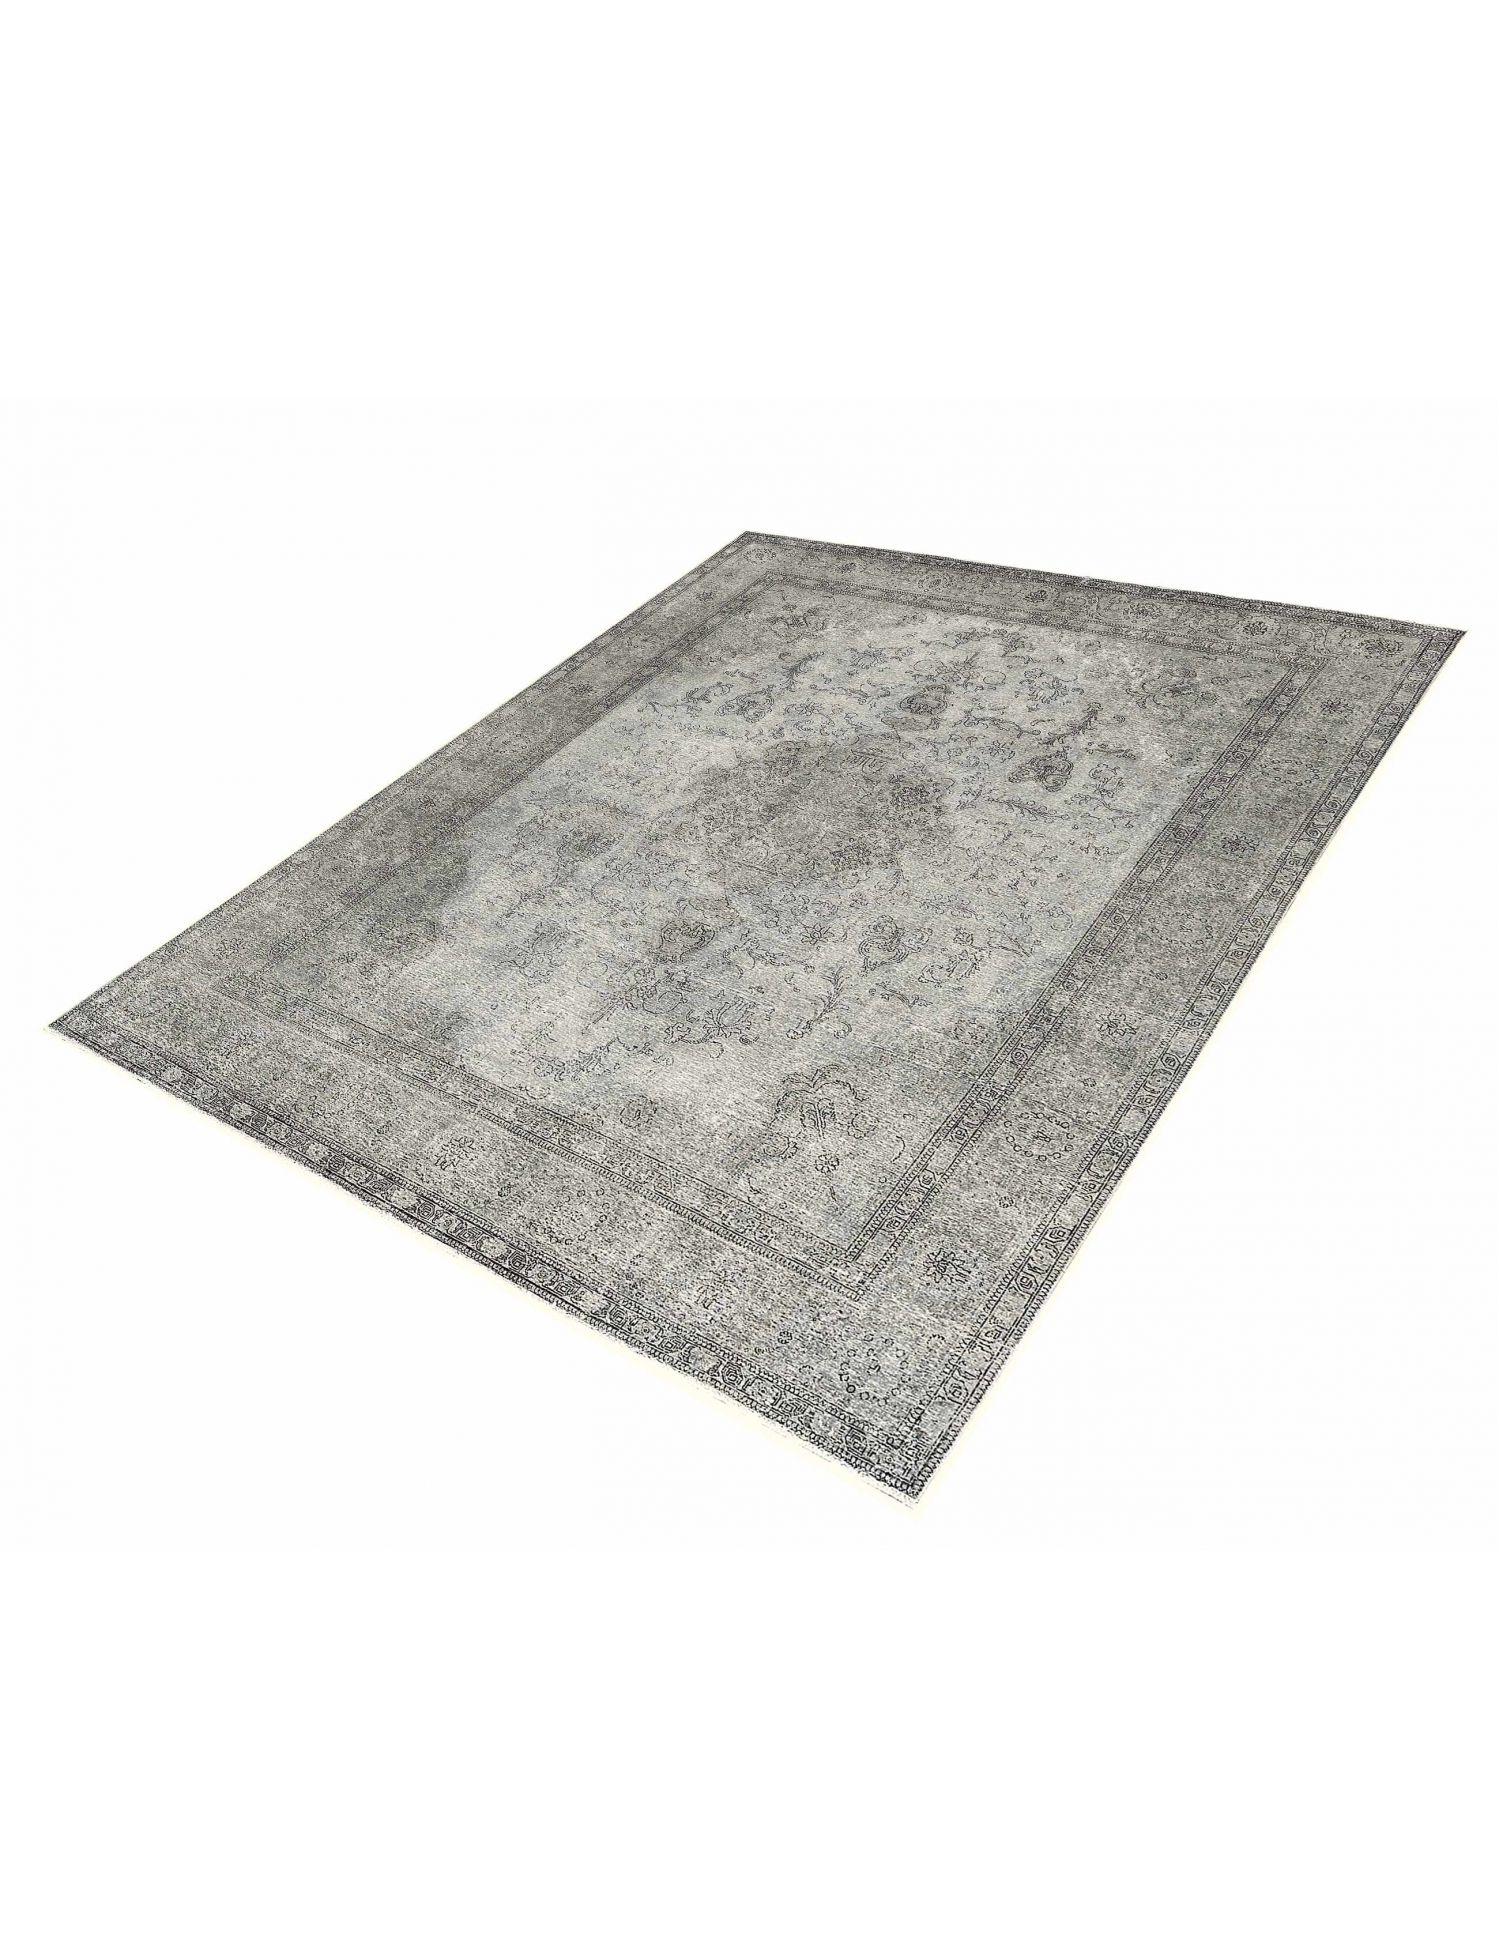 Vintage Perserteppich  grau <br/>383 x 291 cm